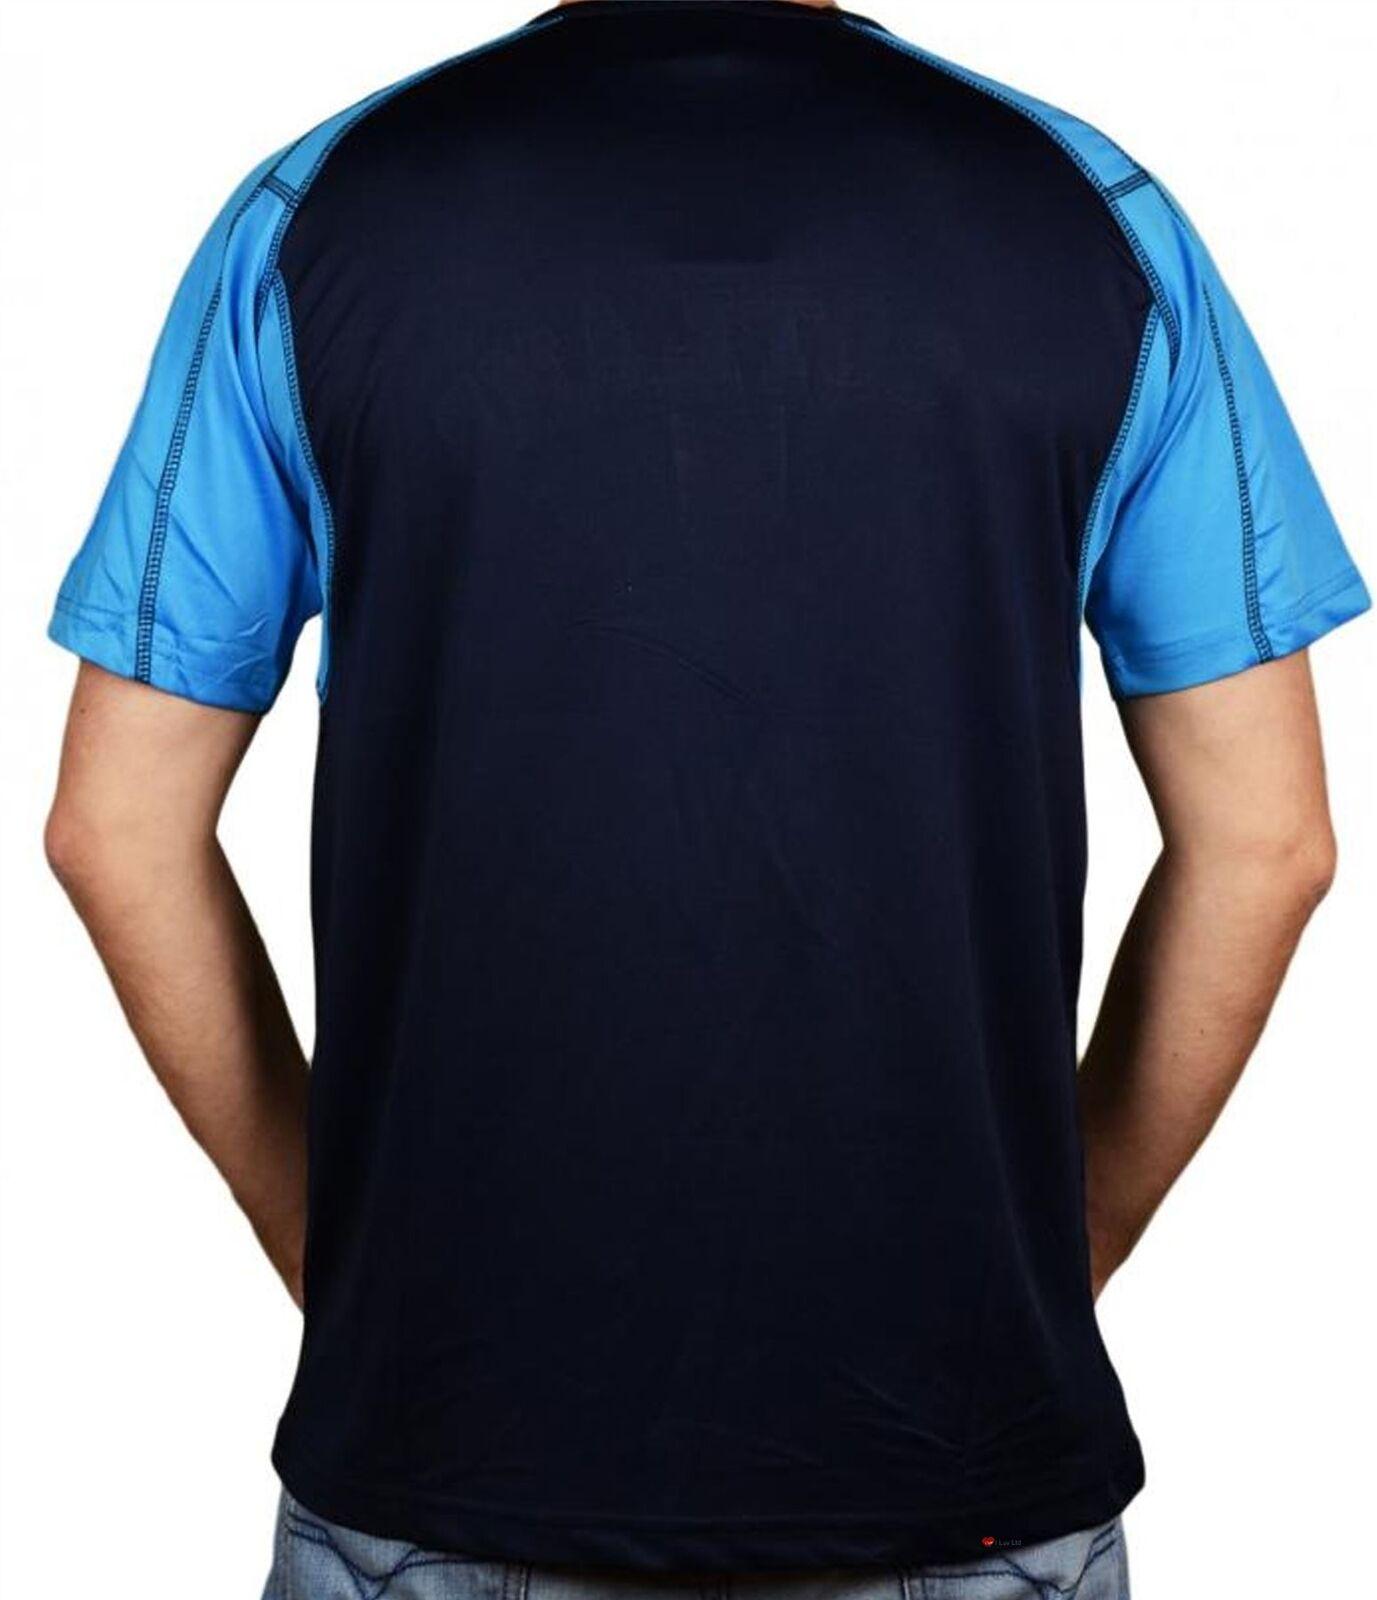 150d4e87 Gents N. 9 T-shirt con ricamato ricamato ricamato SCOZIA testo